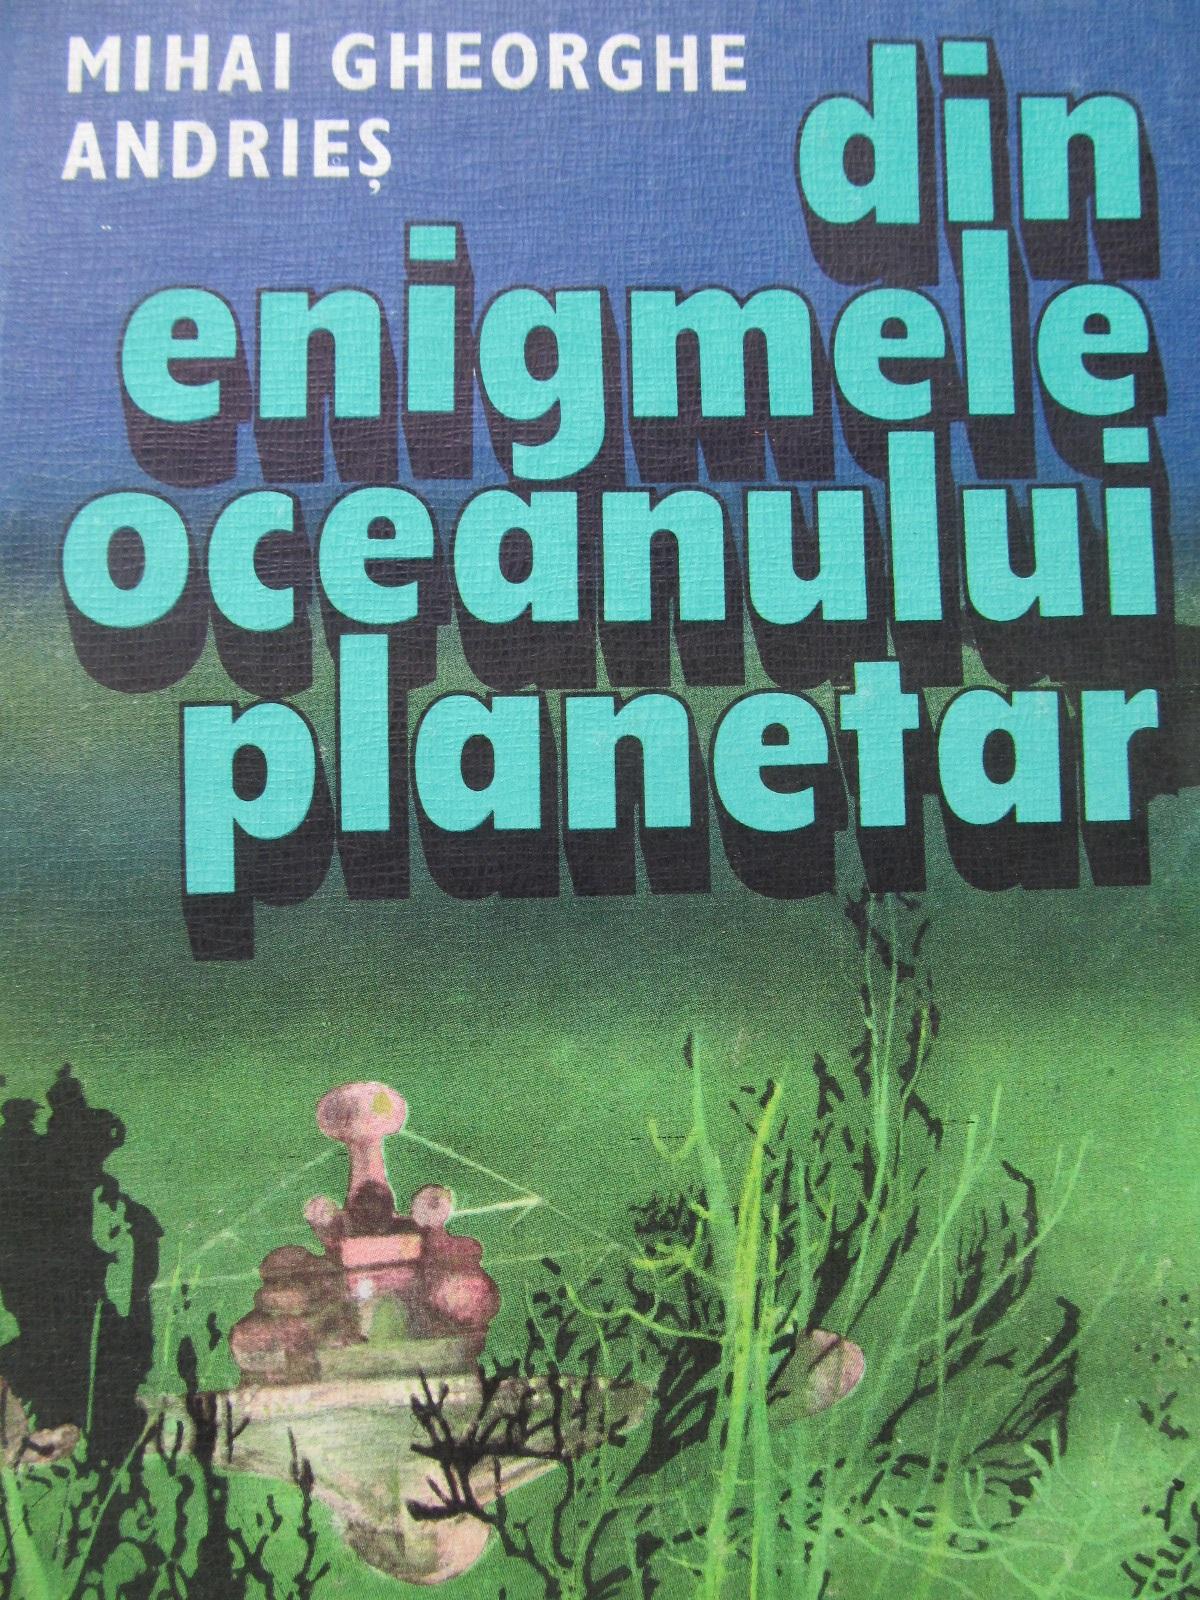 Din enigmele oceanului planetar - Mihai Gheorghe Andries | Detalii carte